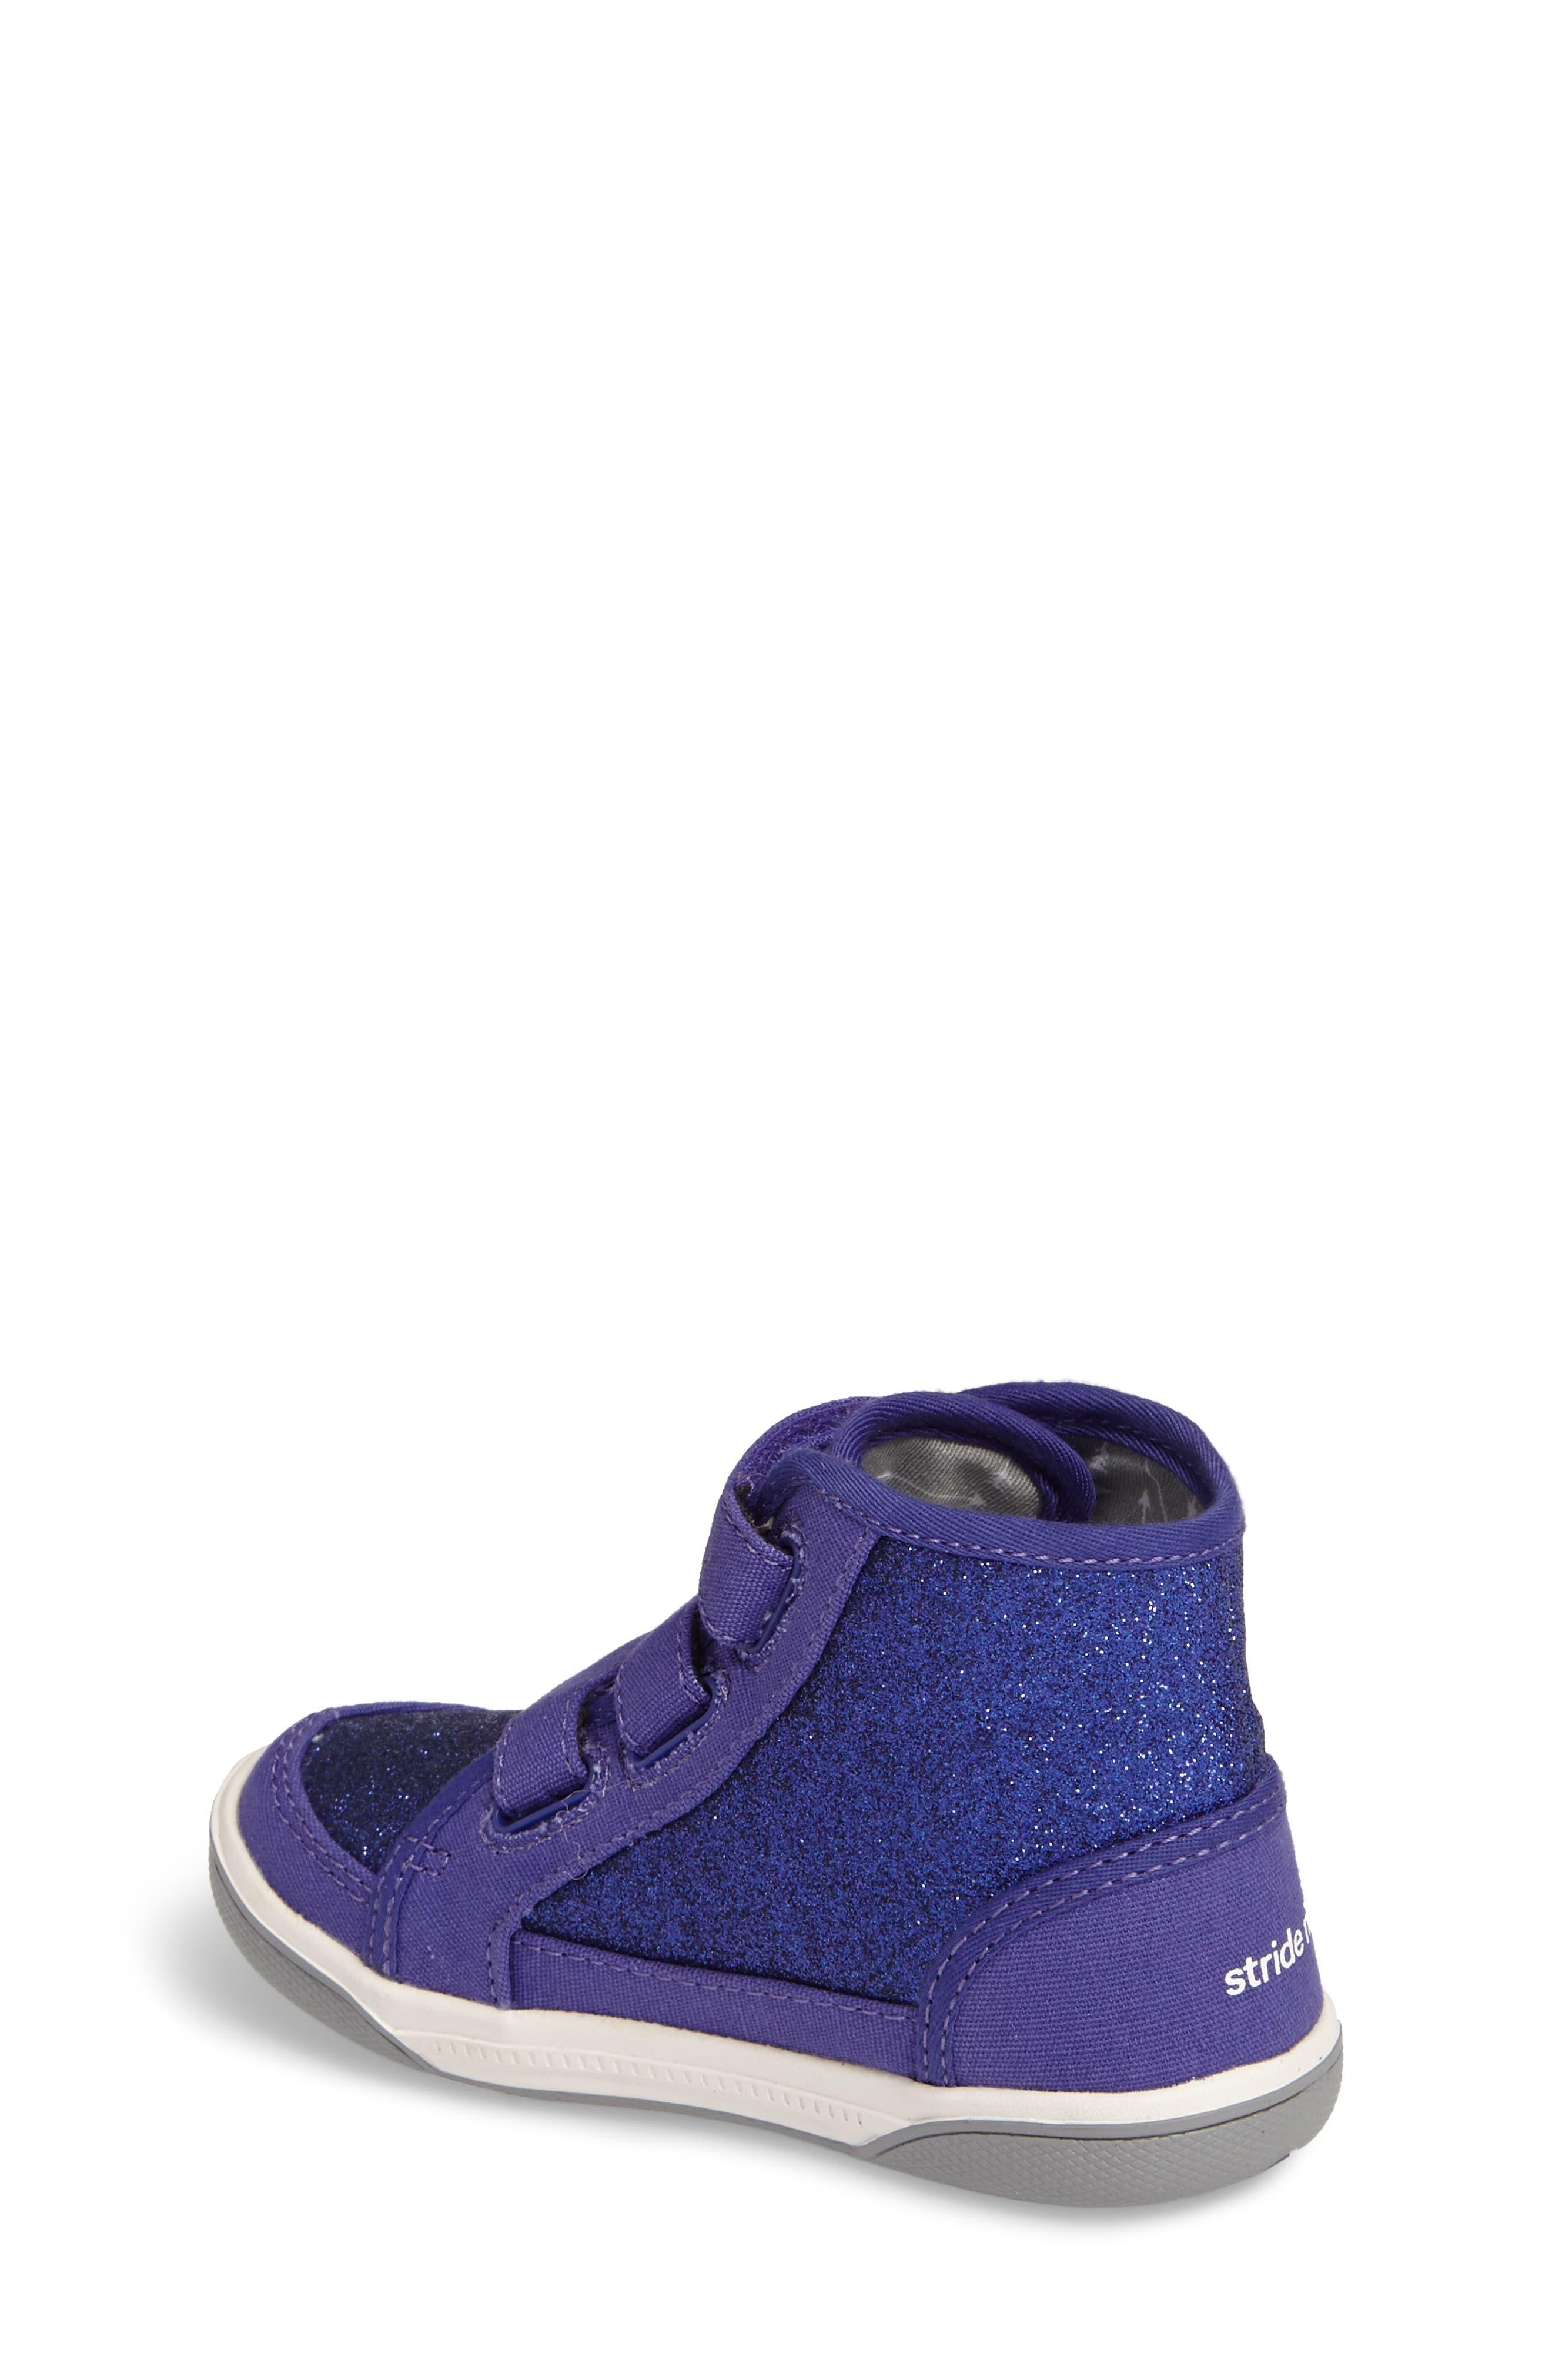 Alternate Image 2  - Stride Rite Ellis Glitter High Top Sneaker (Baby, Walker & Toddler)